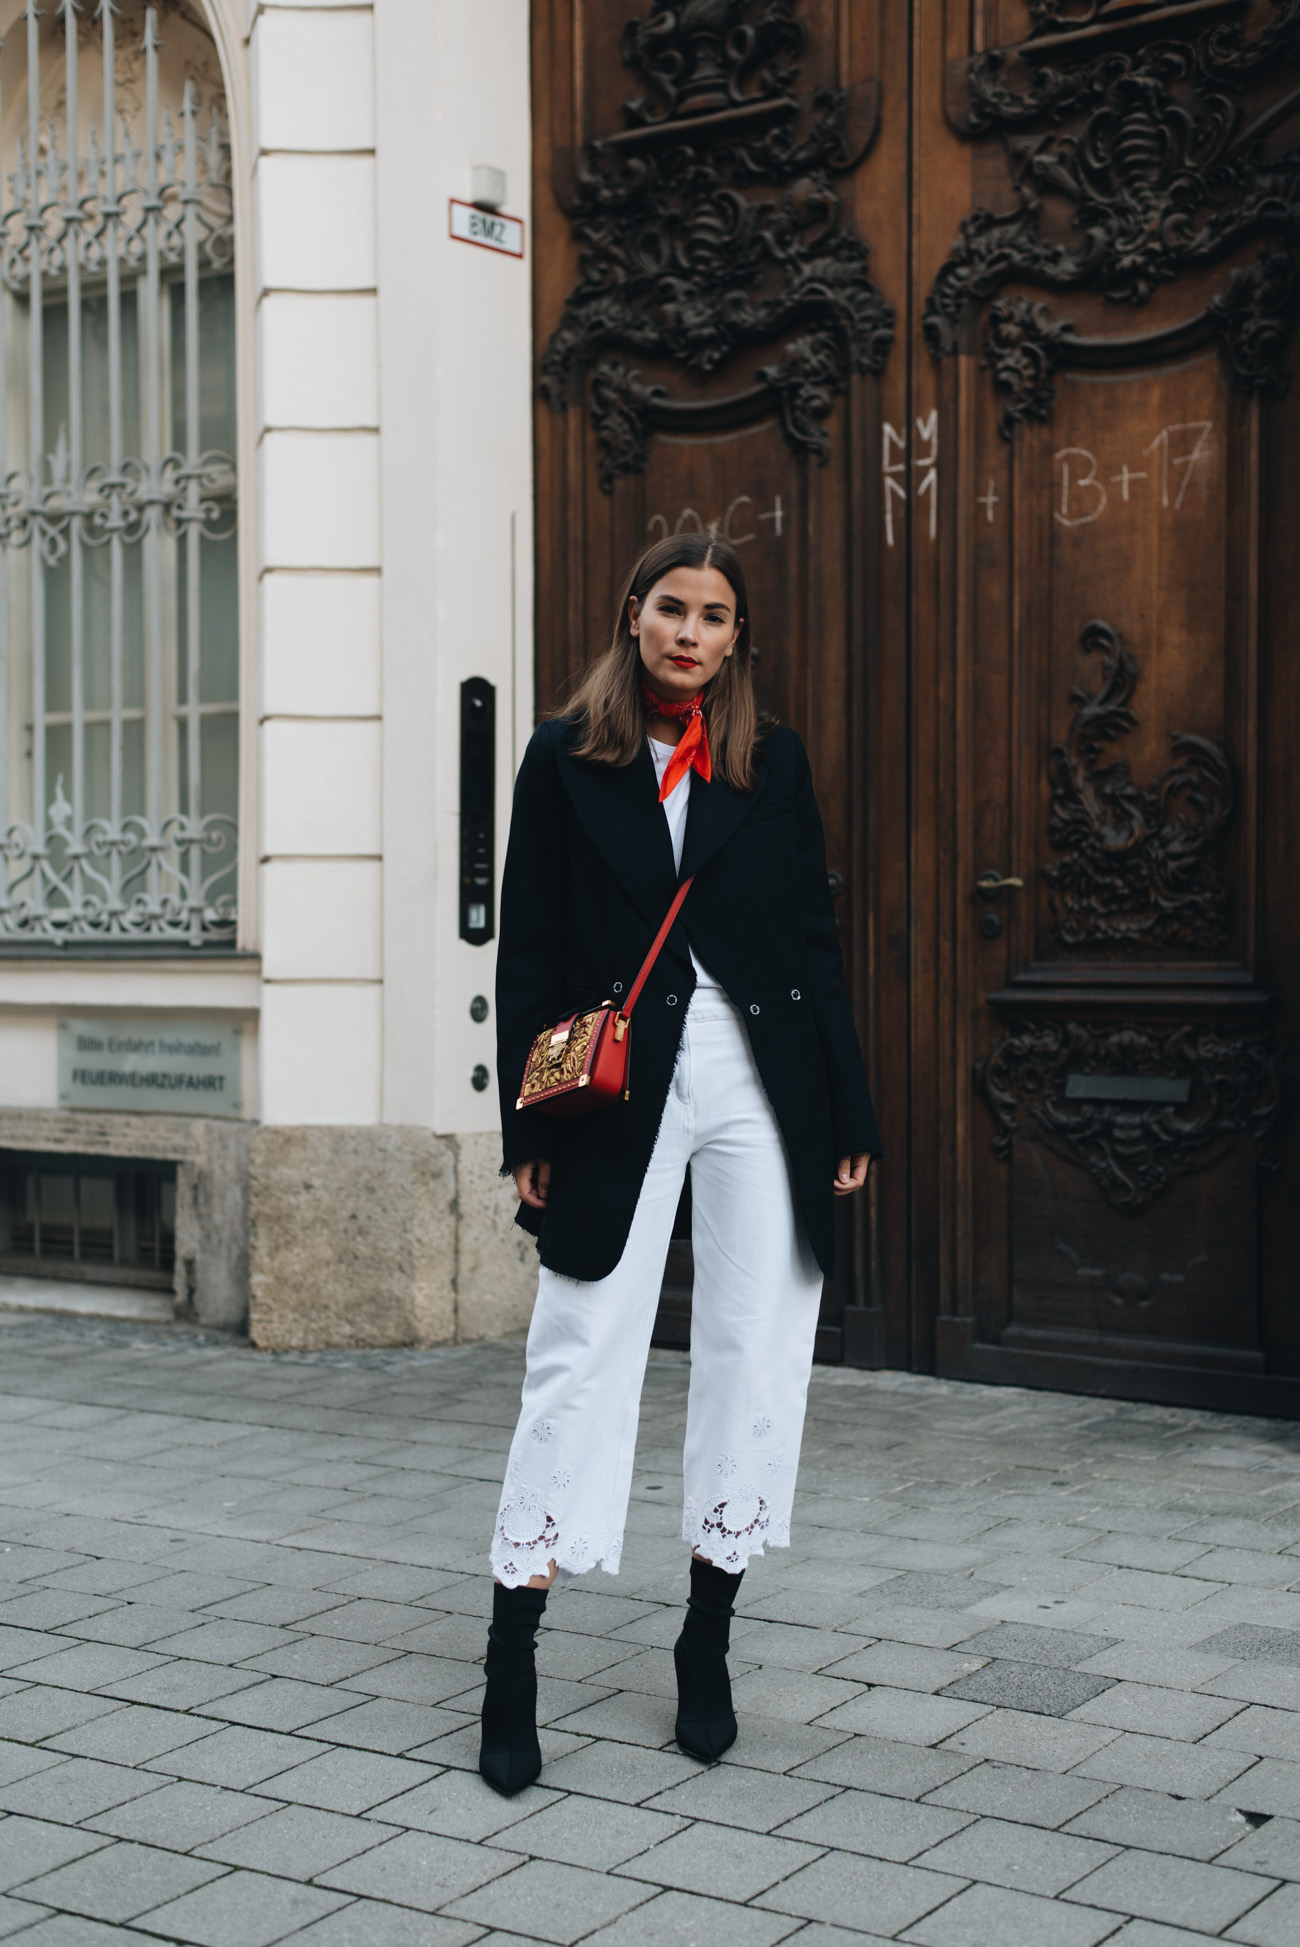 Dior-tuch-bandana-mode-bloggerin-fashiioncarpet-nina-schwichtenberg